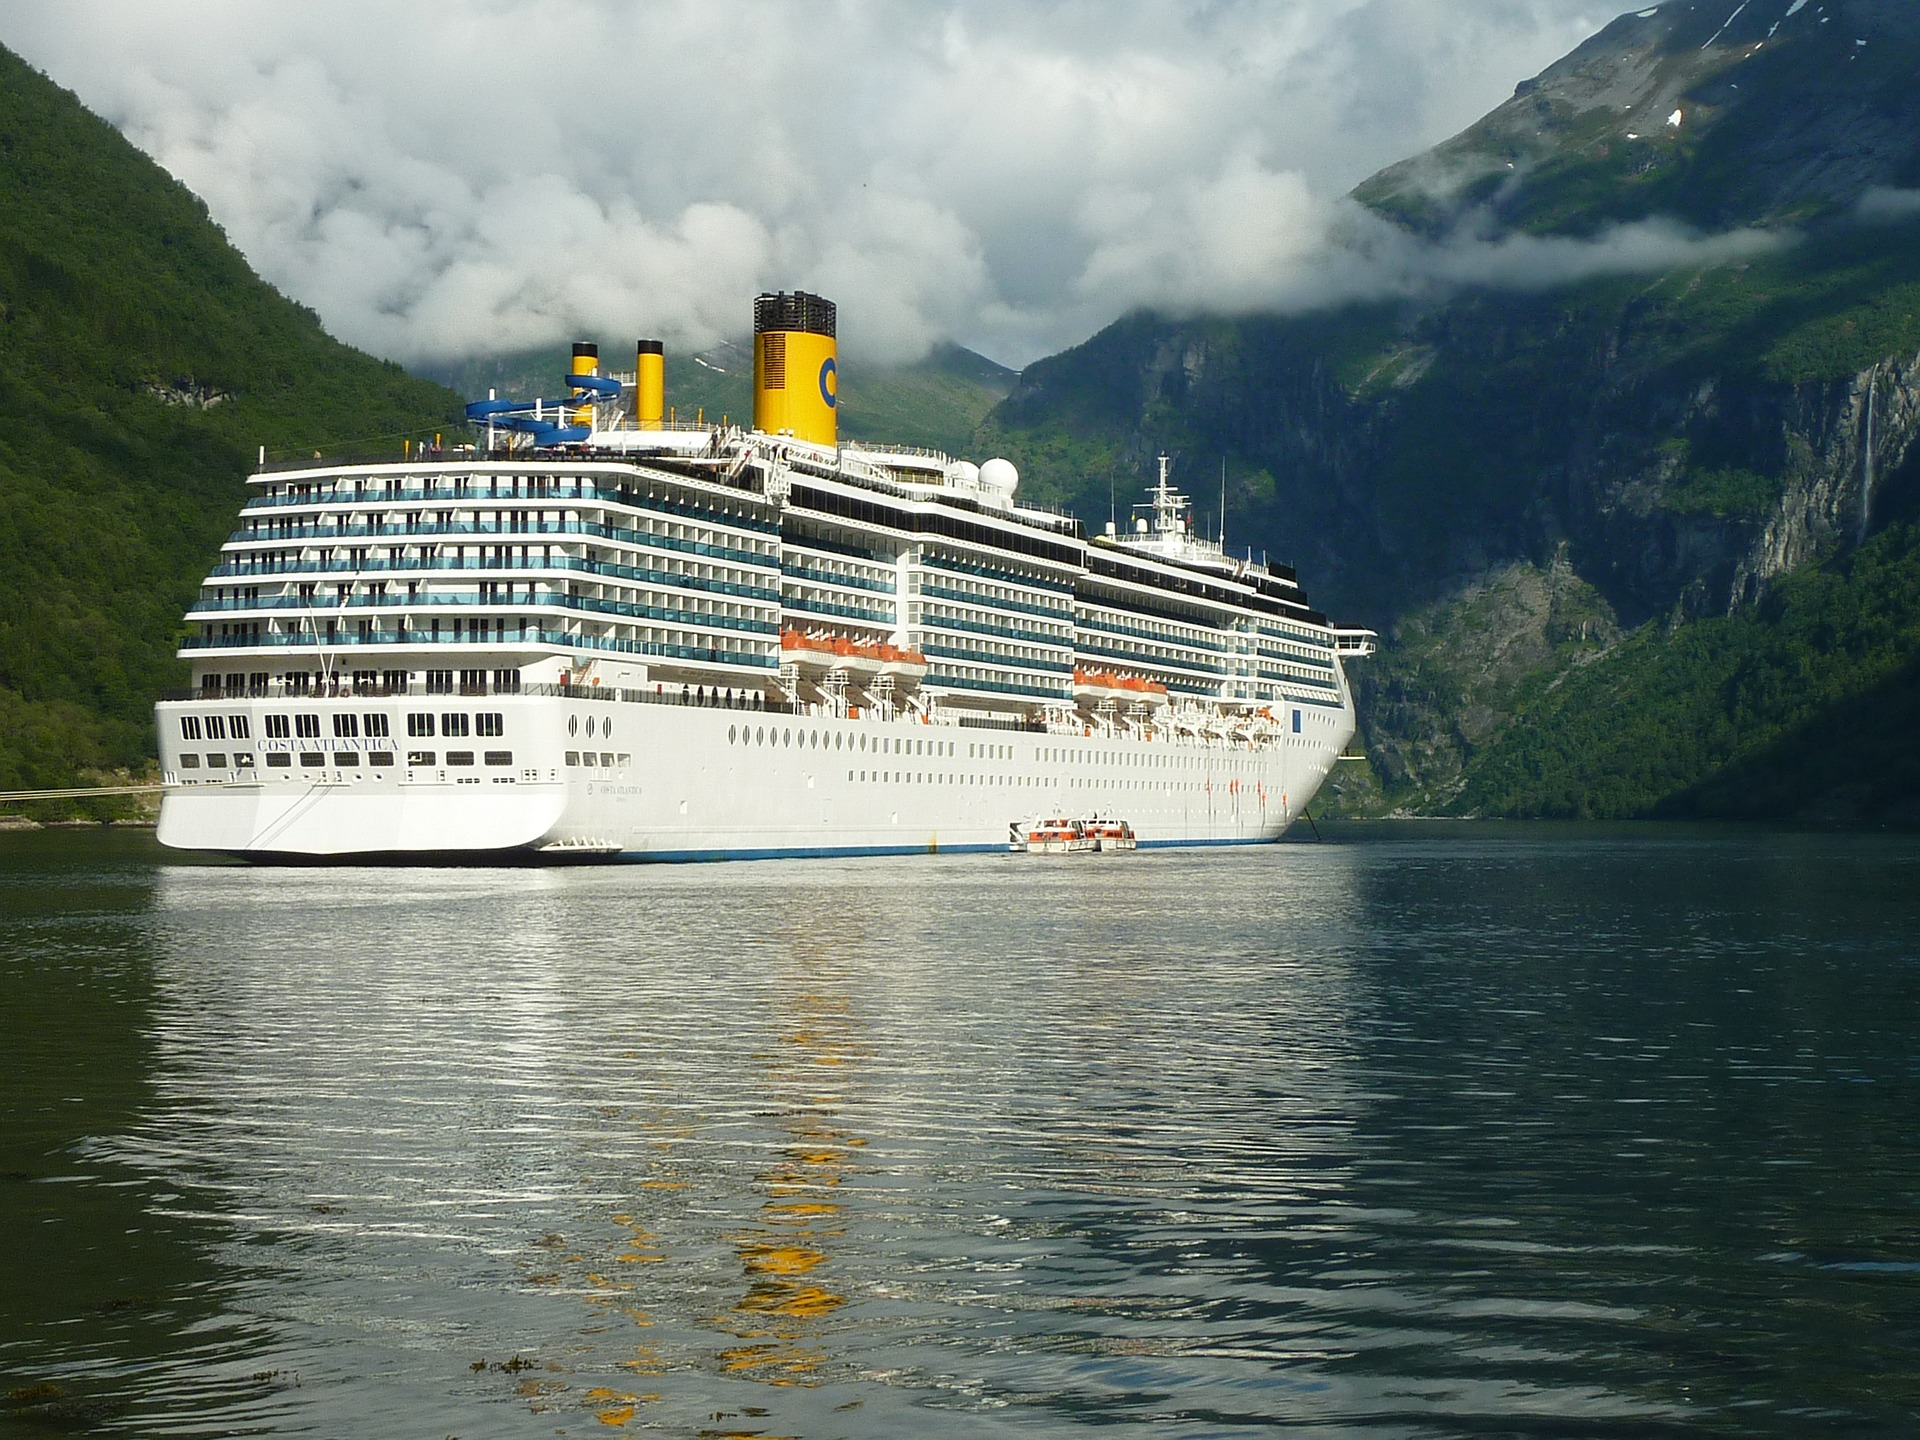 Costa Smeralda: itinerario della nave da crociera